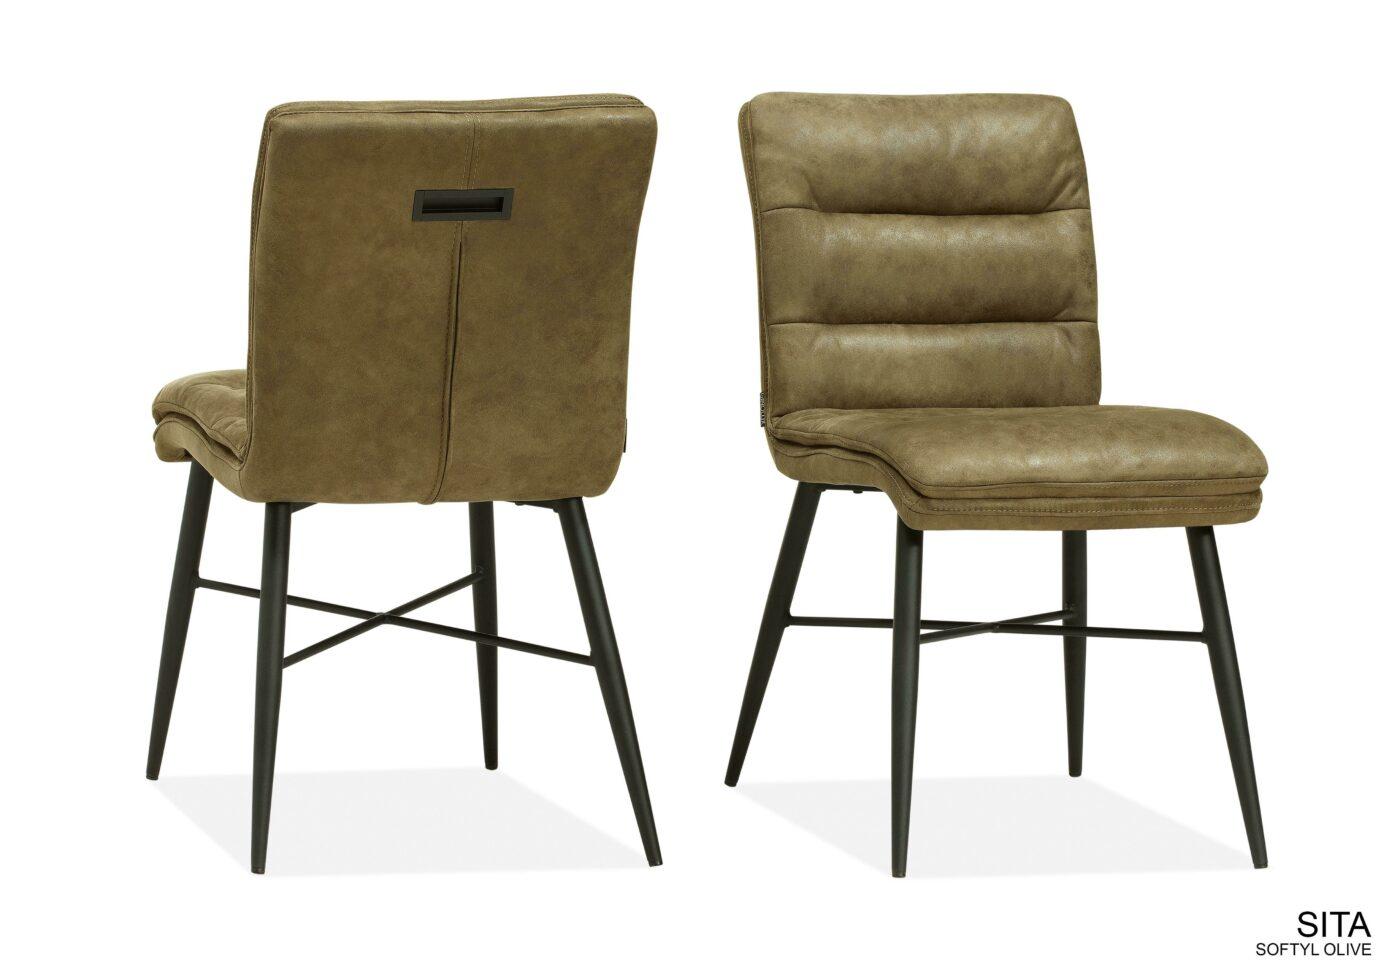 Sita stoel